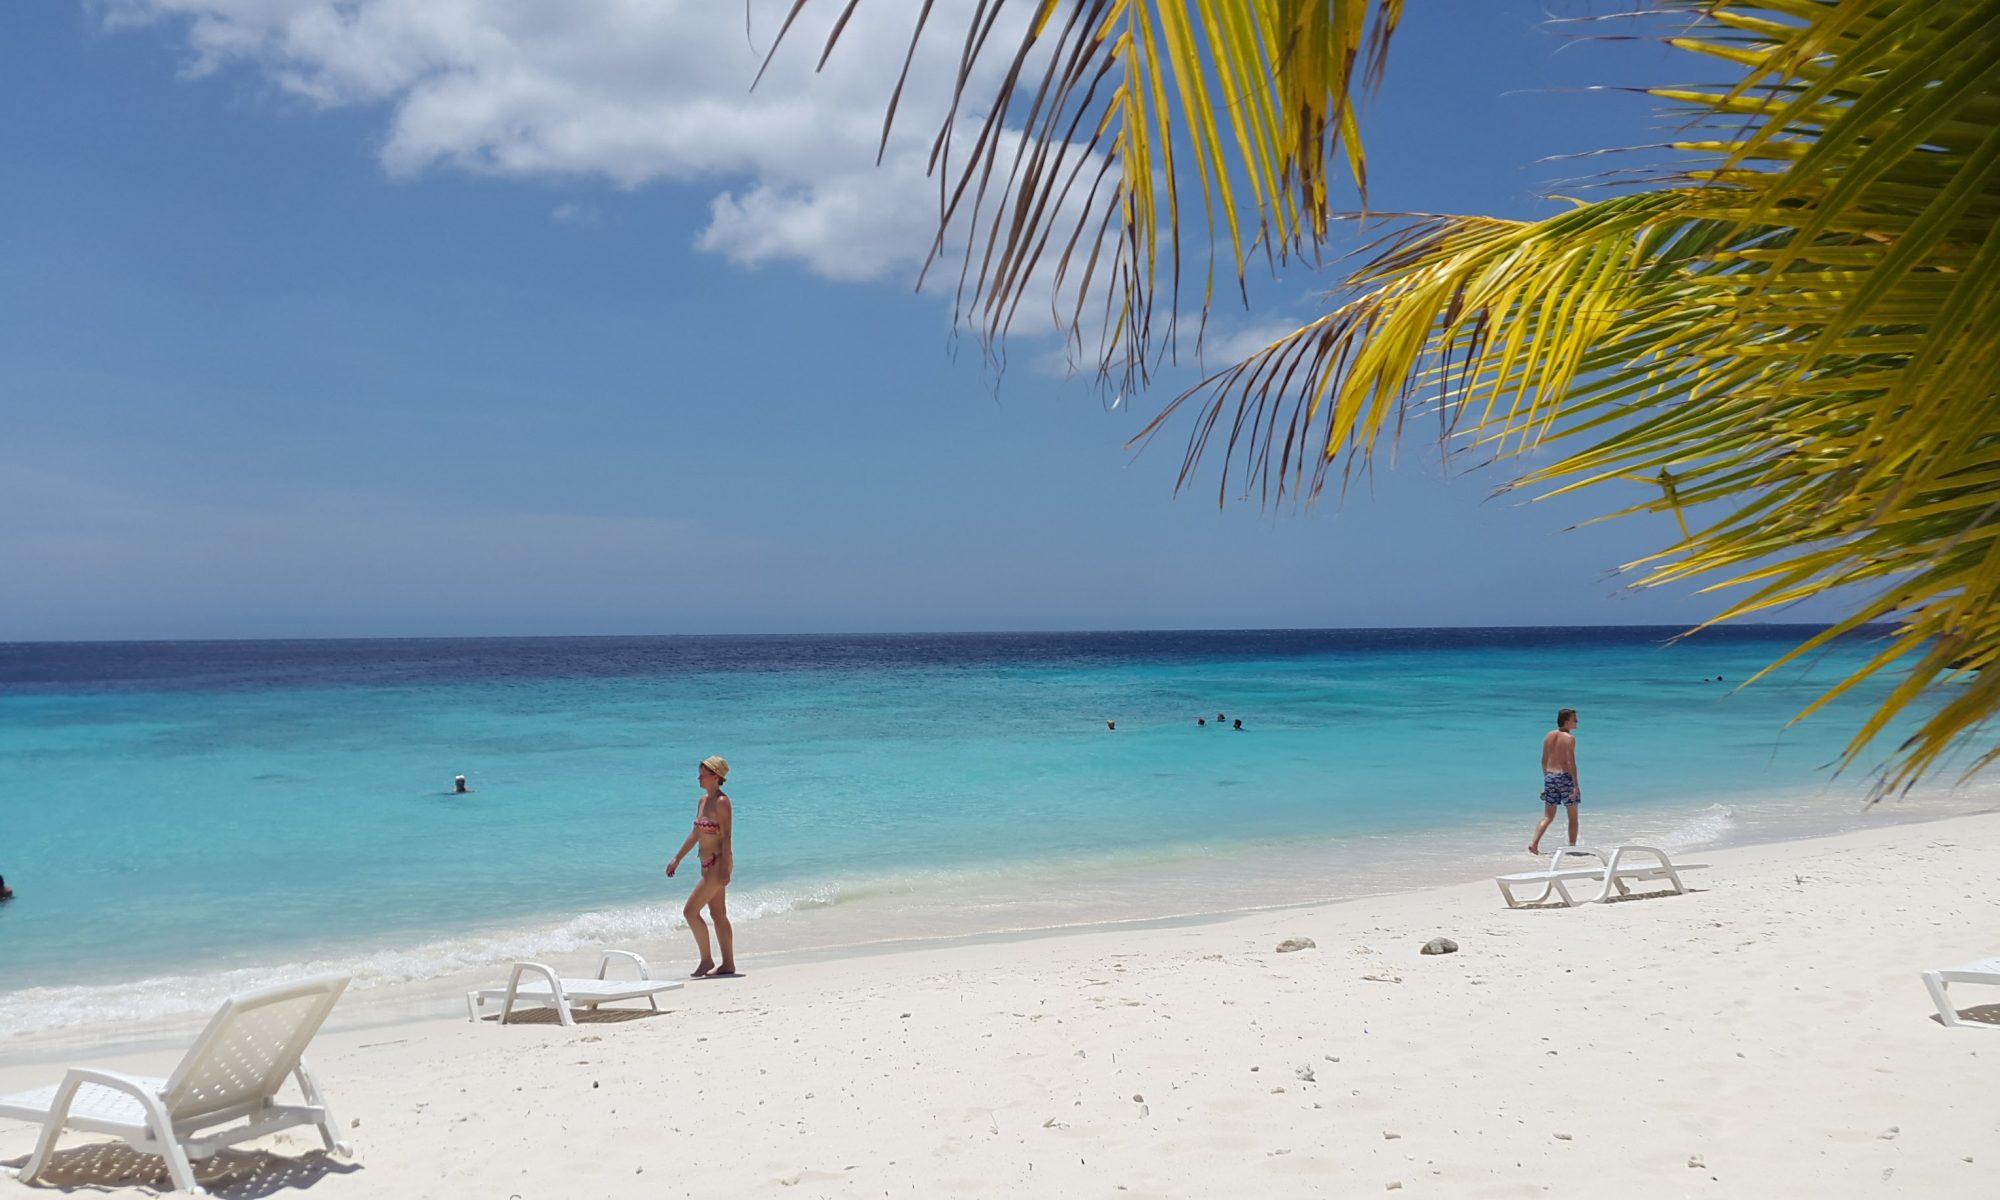 Scuba diving in Curacao